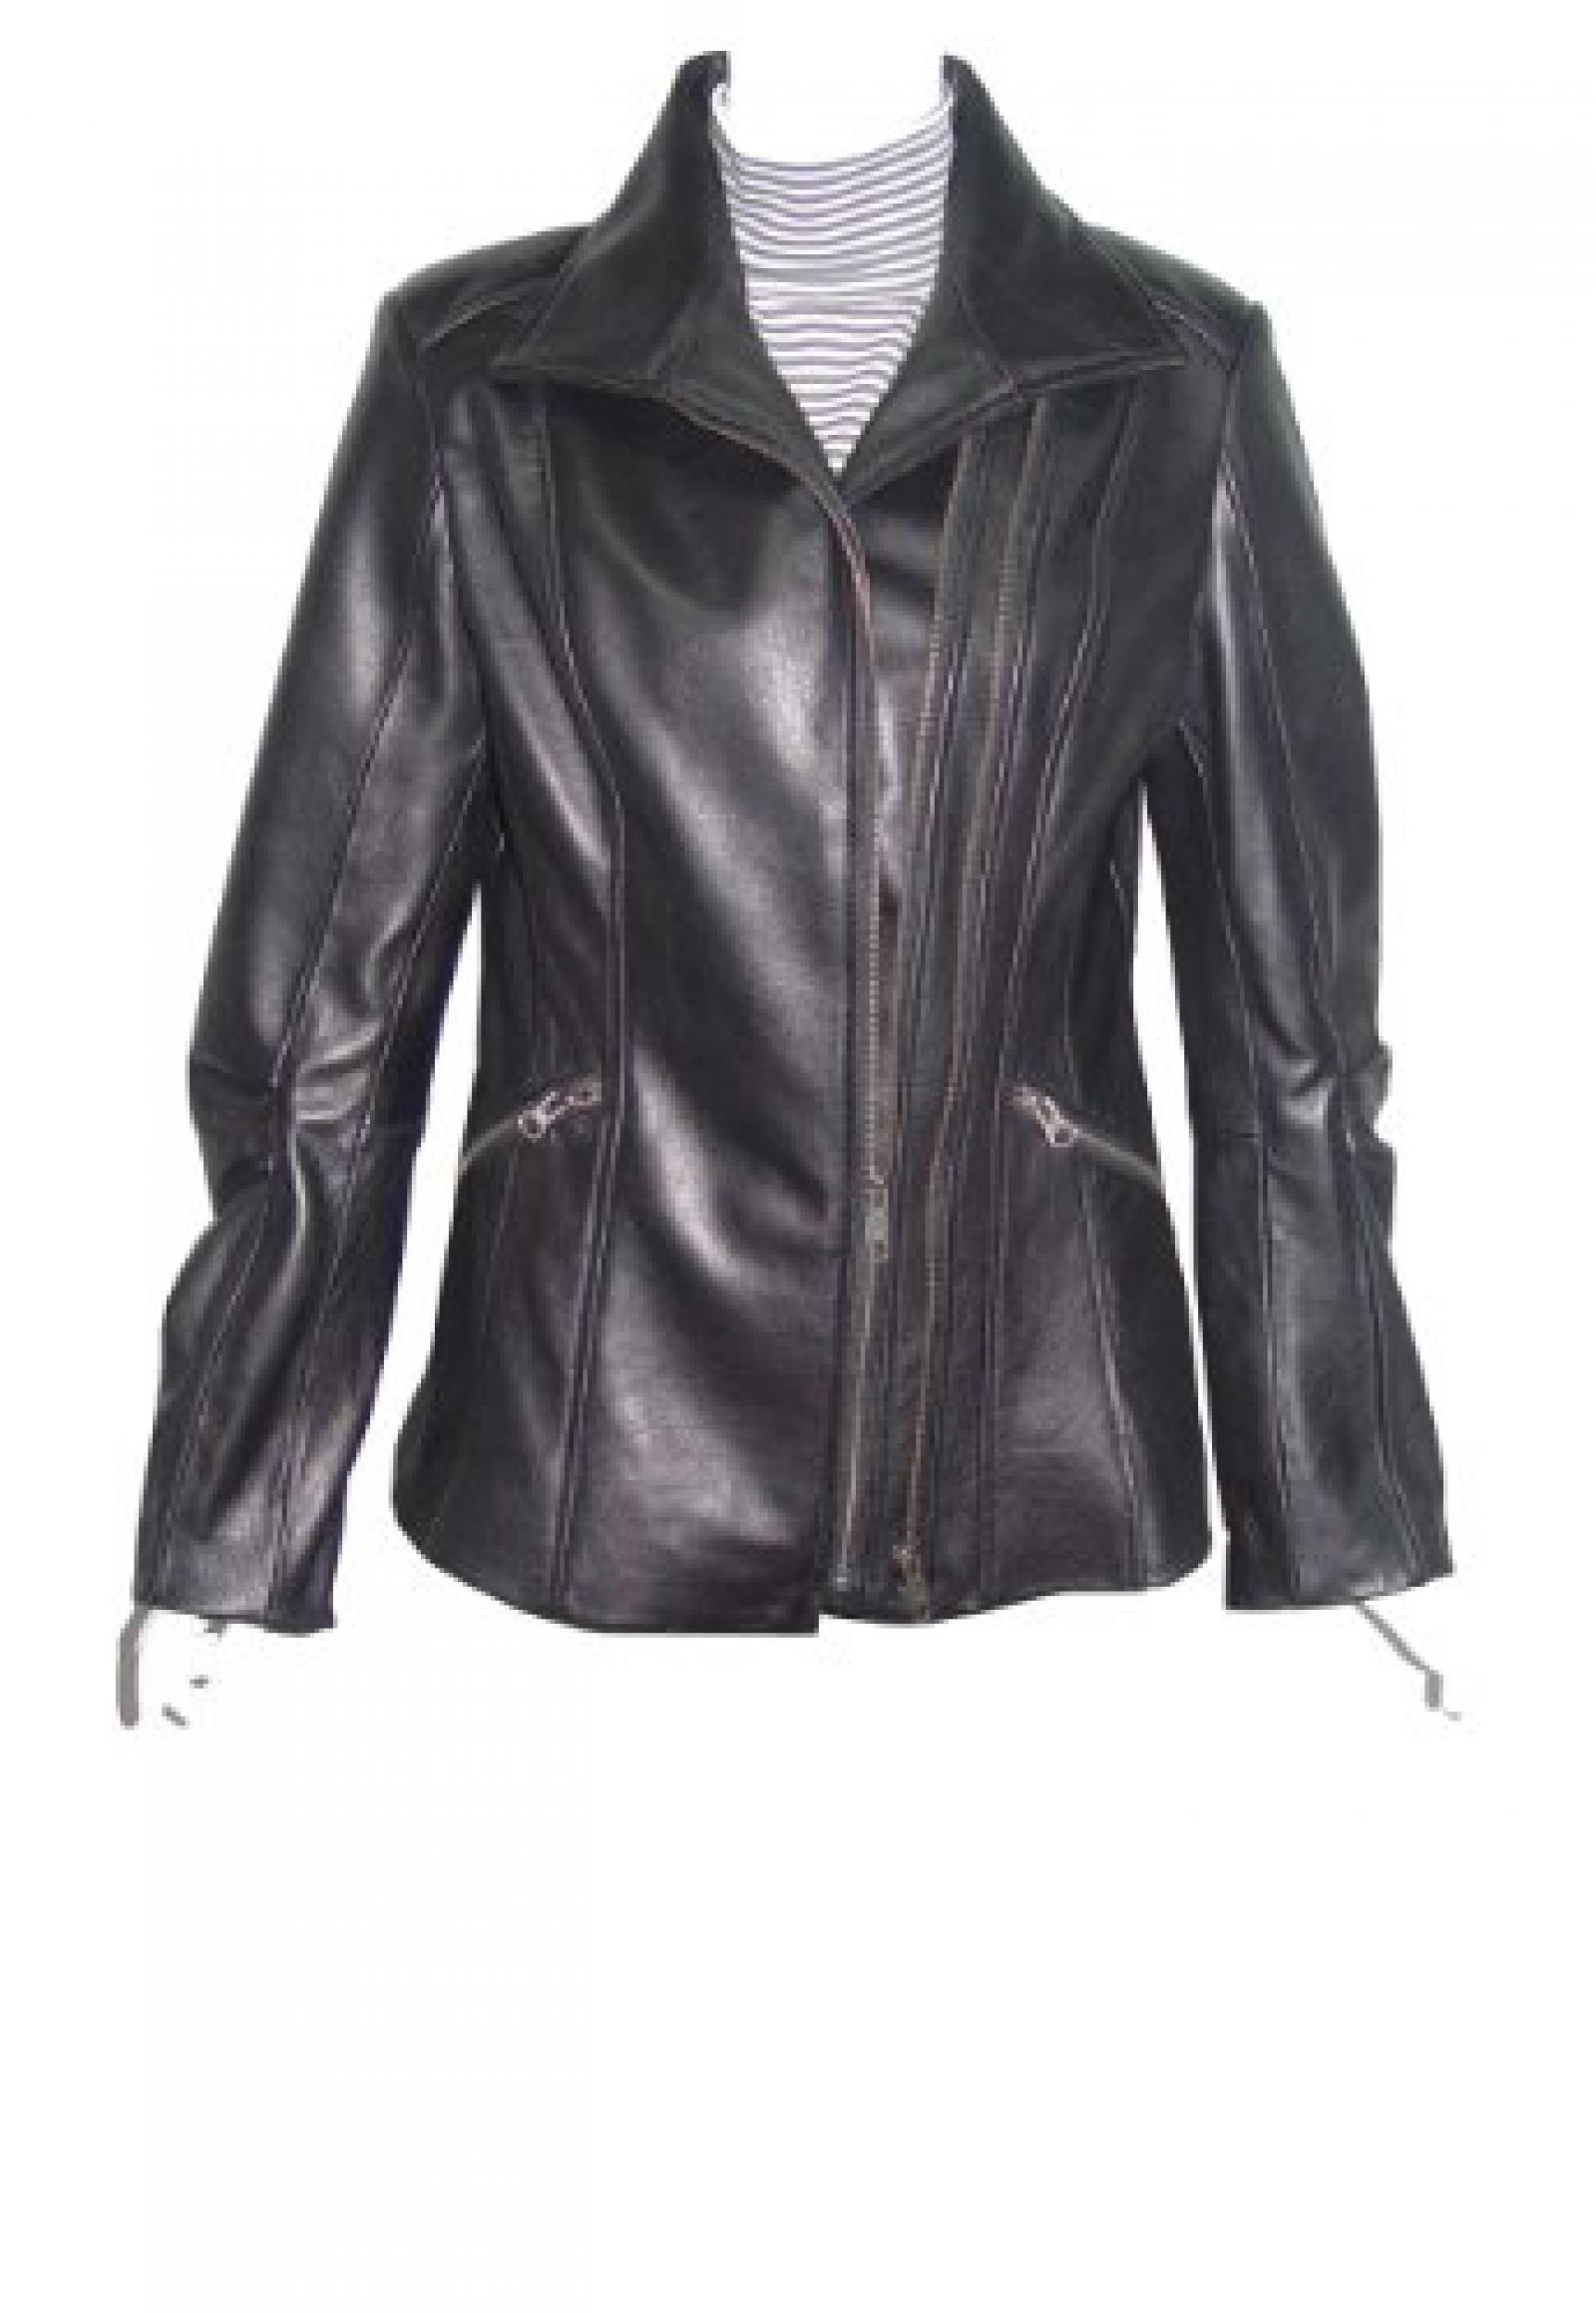 Nettailor Women PLUS SIZE 4196 soft Leather Casual Jacket Double Zip Front